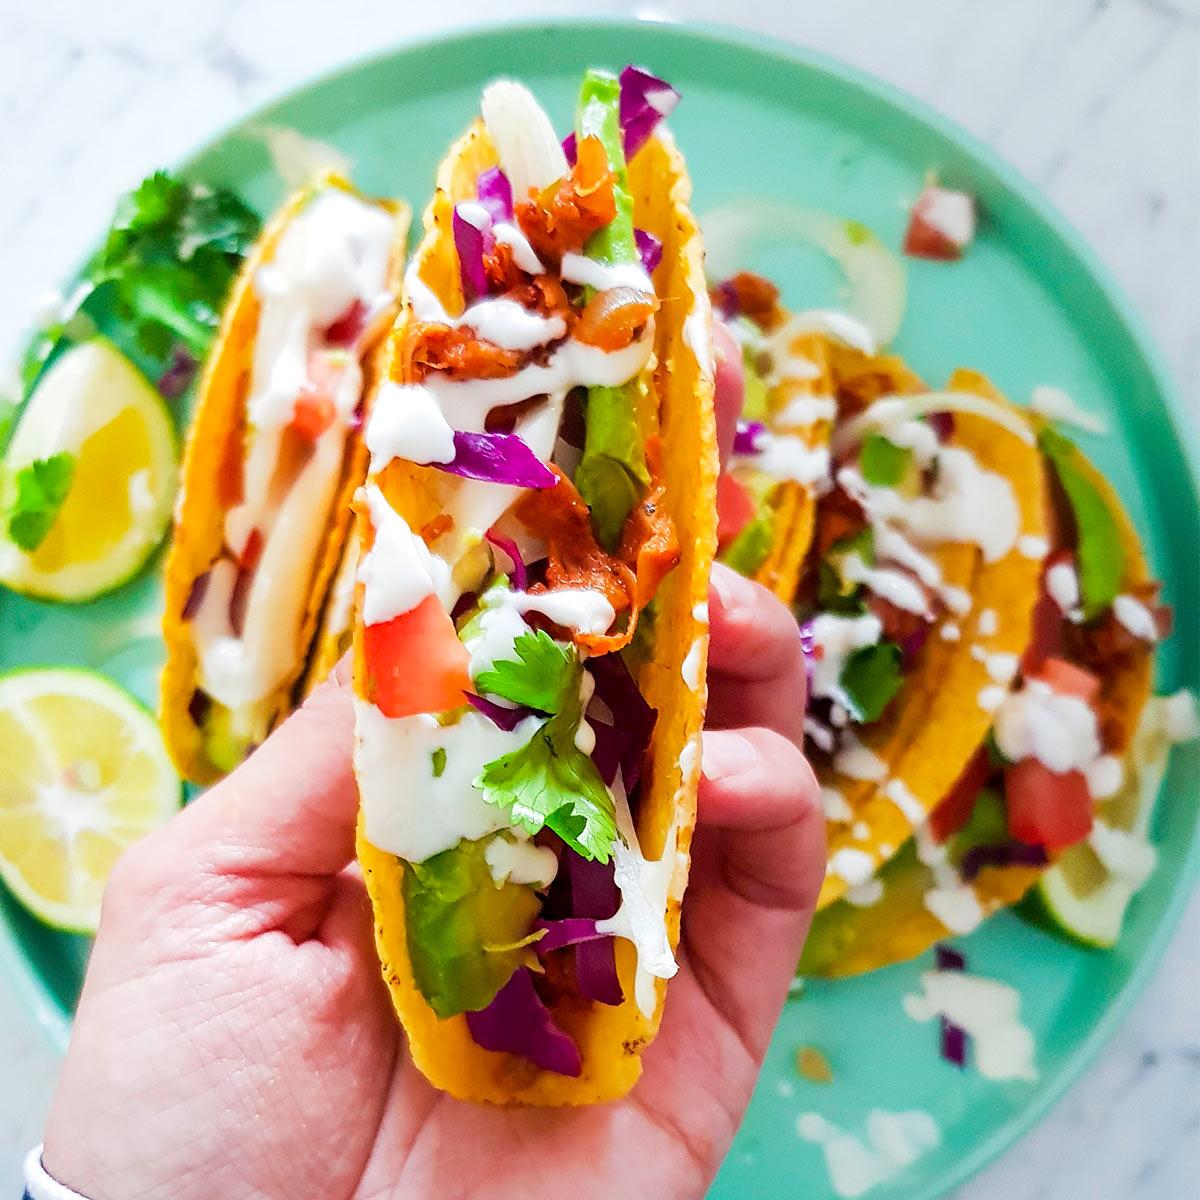 vegan jackfruit taco filled with pulled jackfruit meat